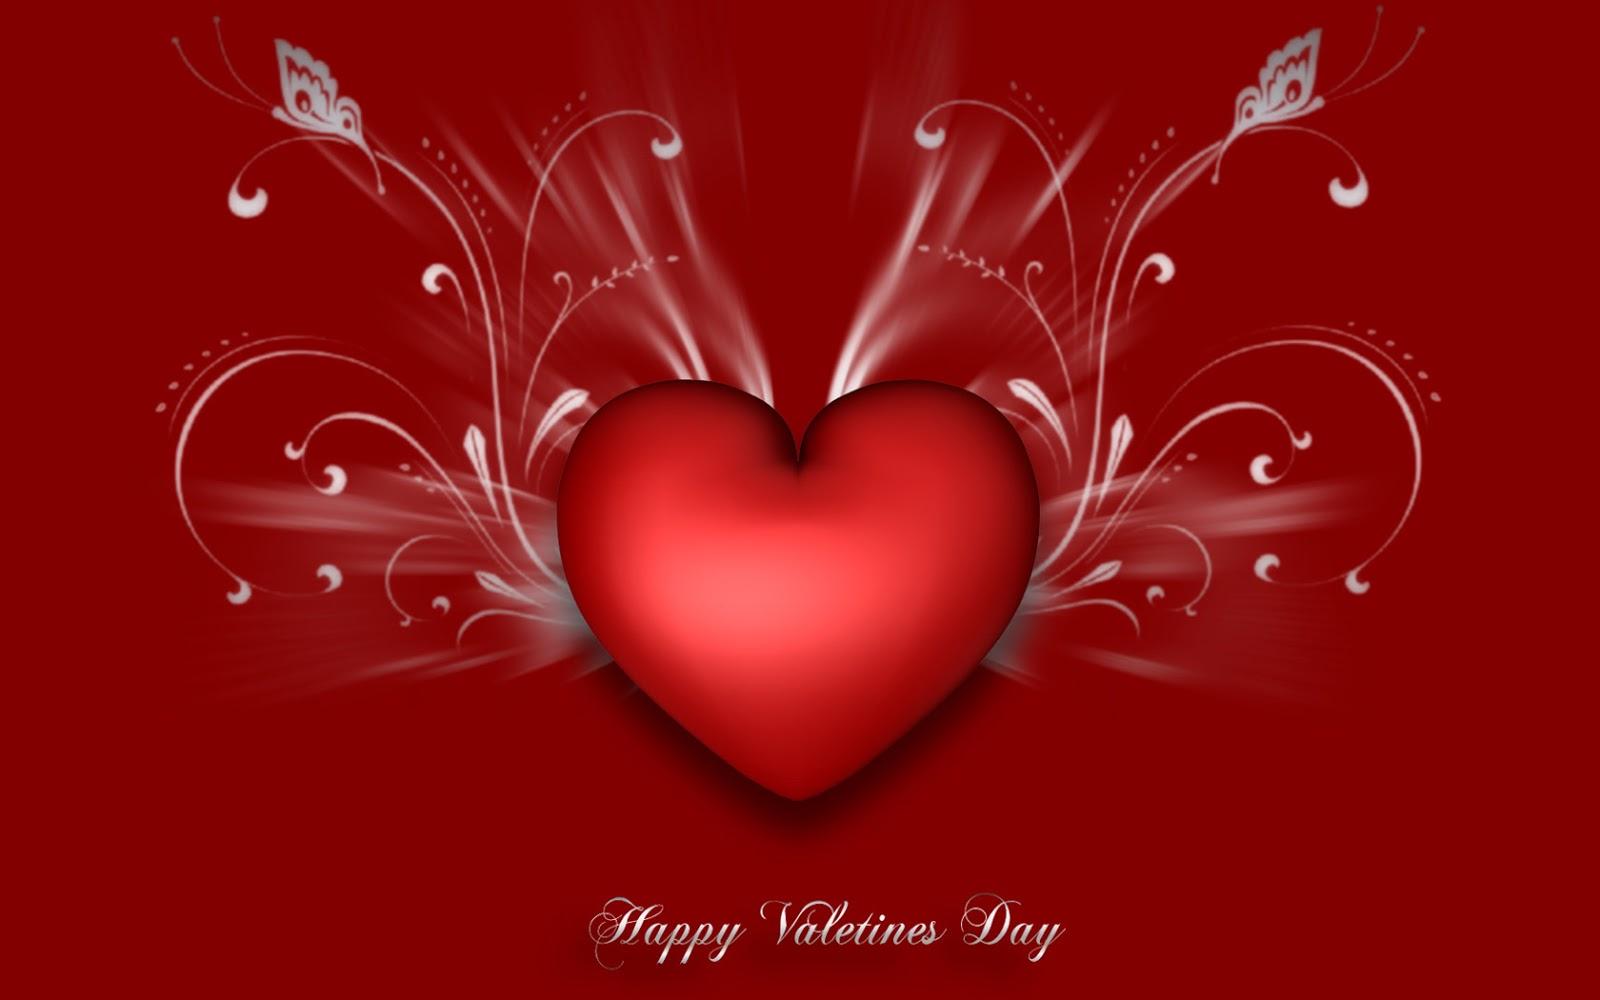 http://3.bp.blogspot.com/-rbp0TfPd_yk/UOwUyPRgMAI/AAAAAAAACNU/jQiNgzAmunY/s1600/a1-valentine-day-wallpaper-1.jpg